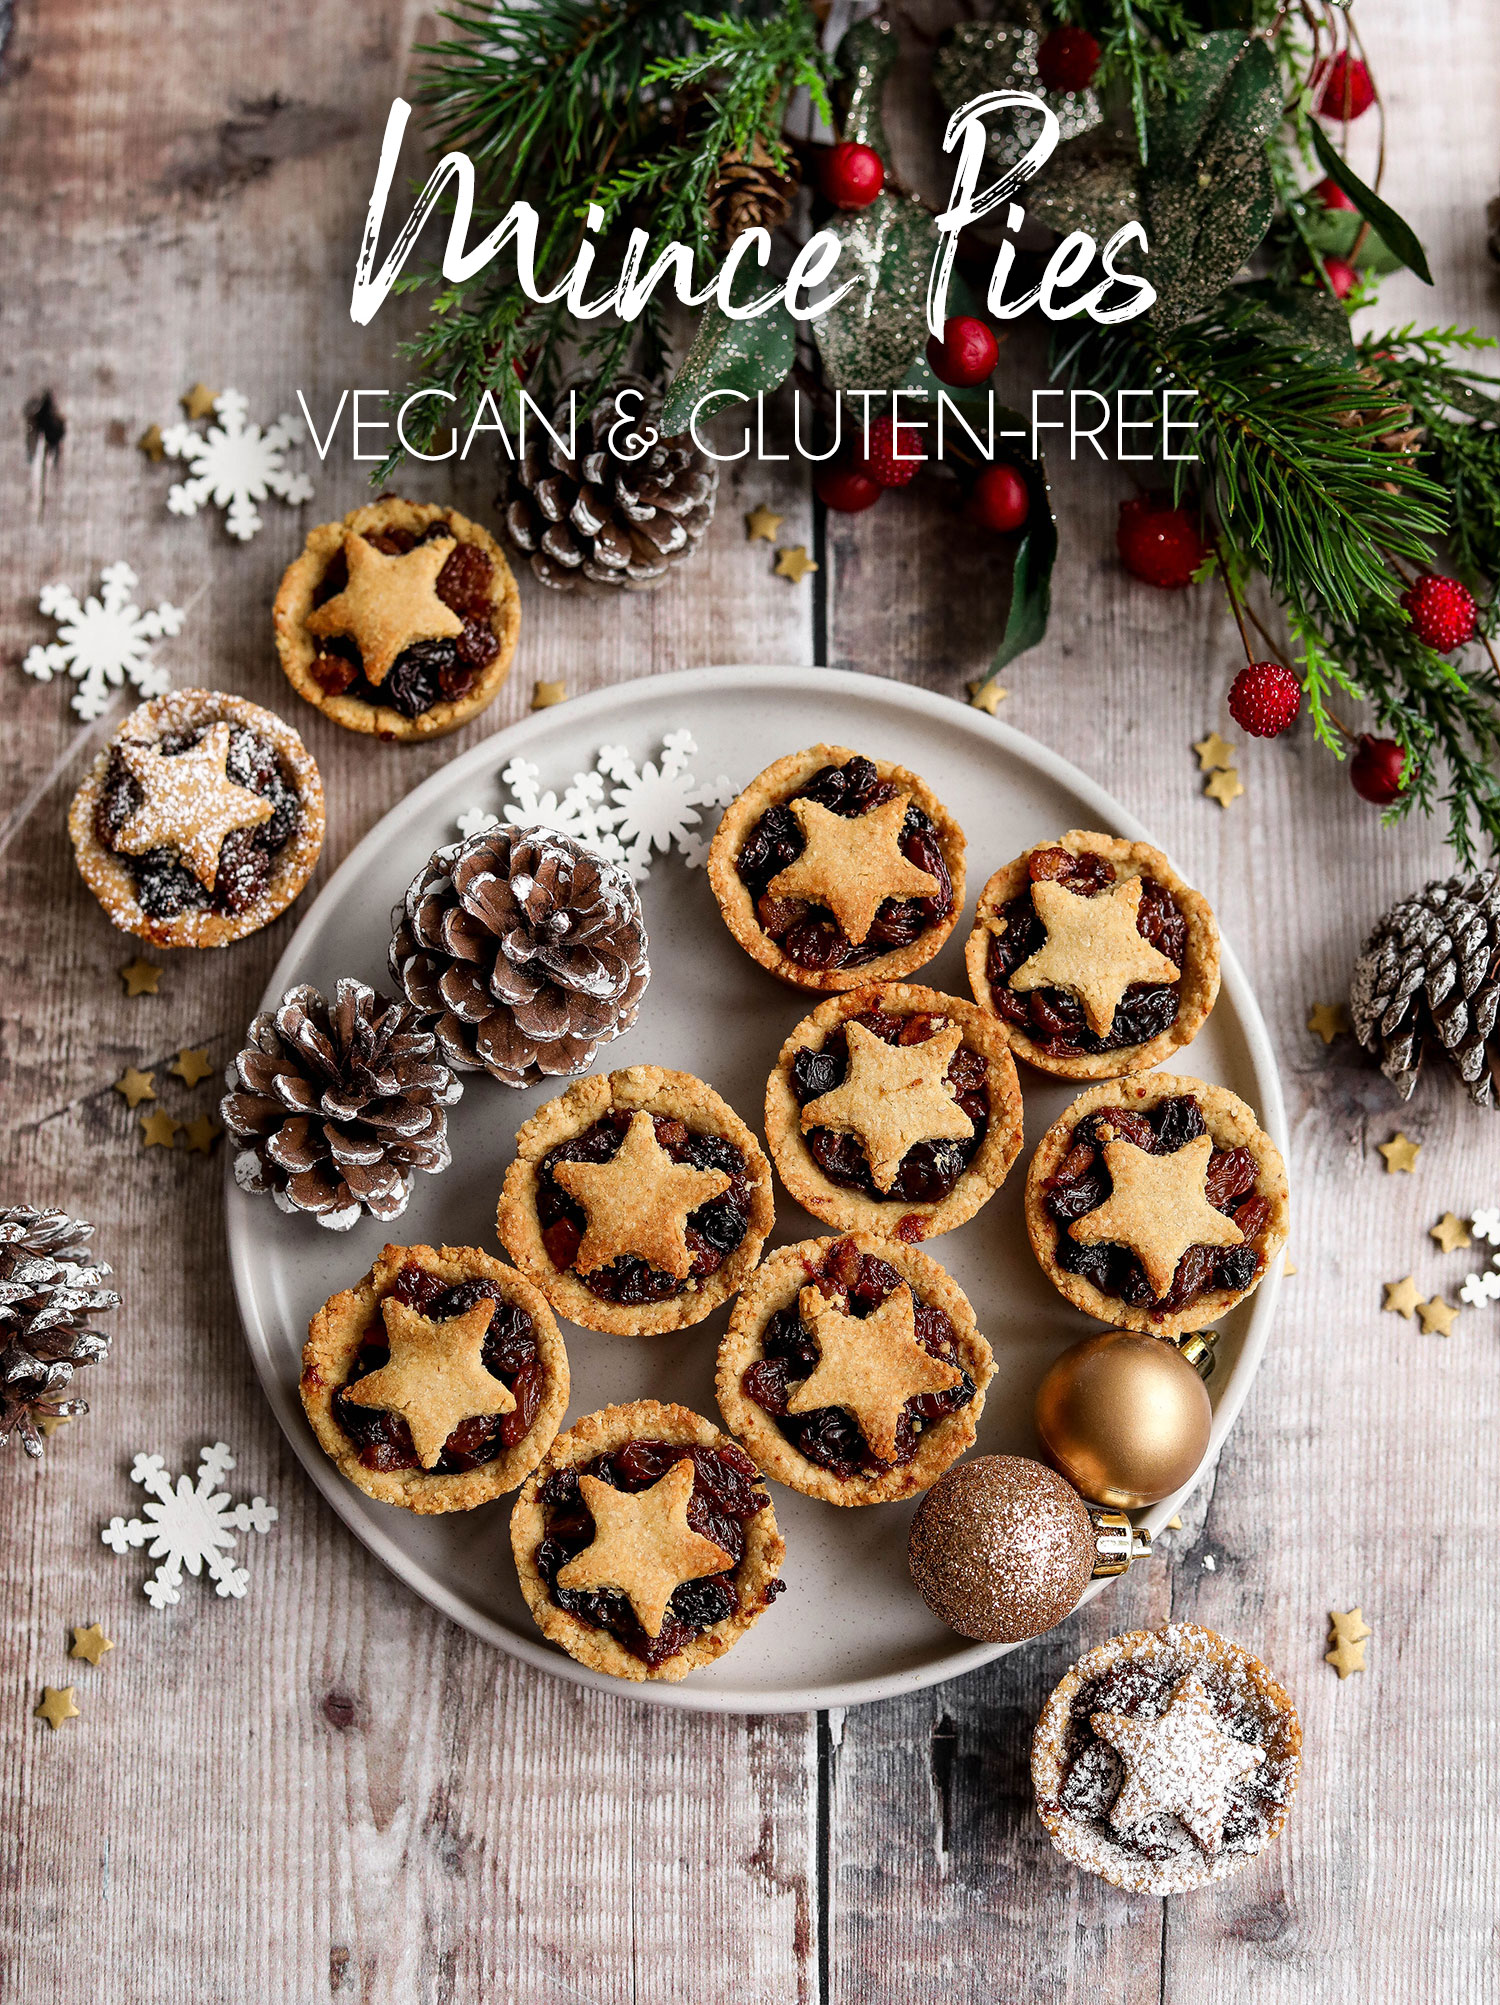 Vegan Gluten-free Mince Pies